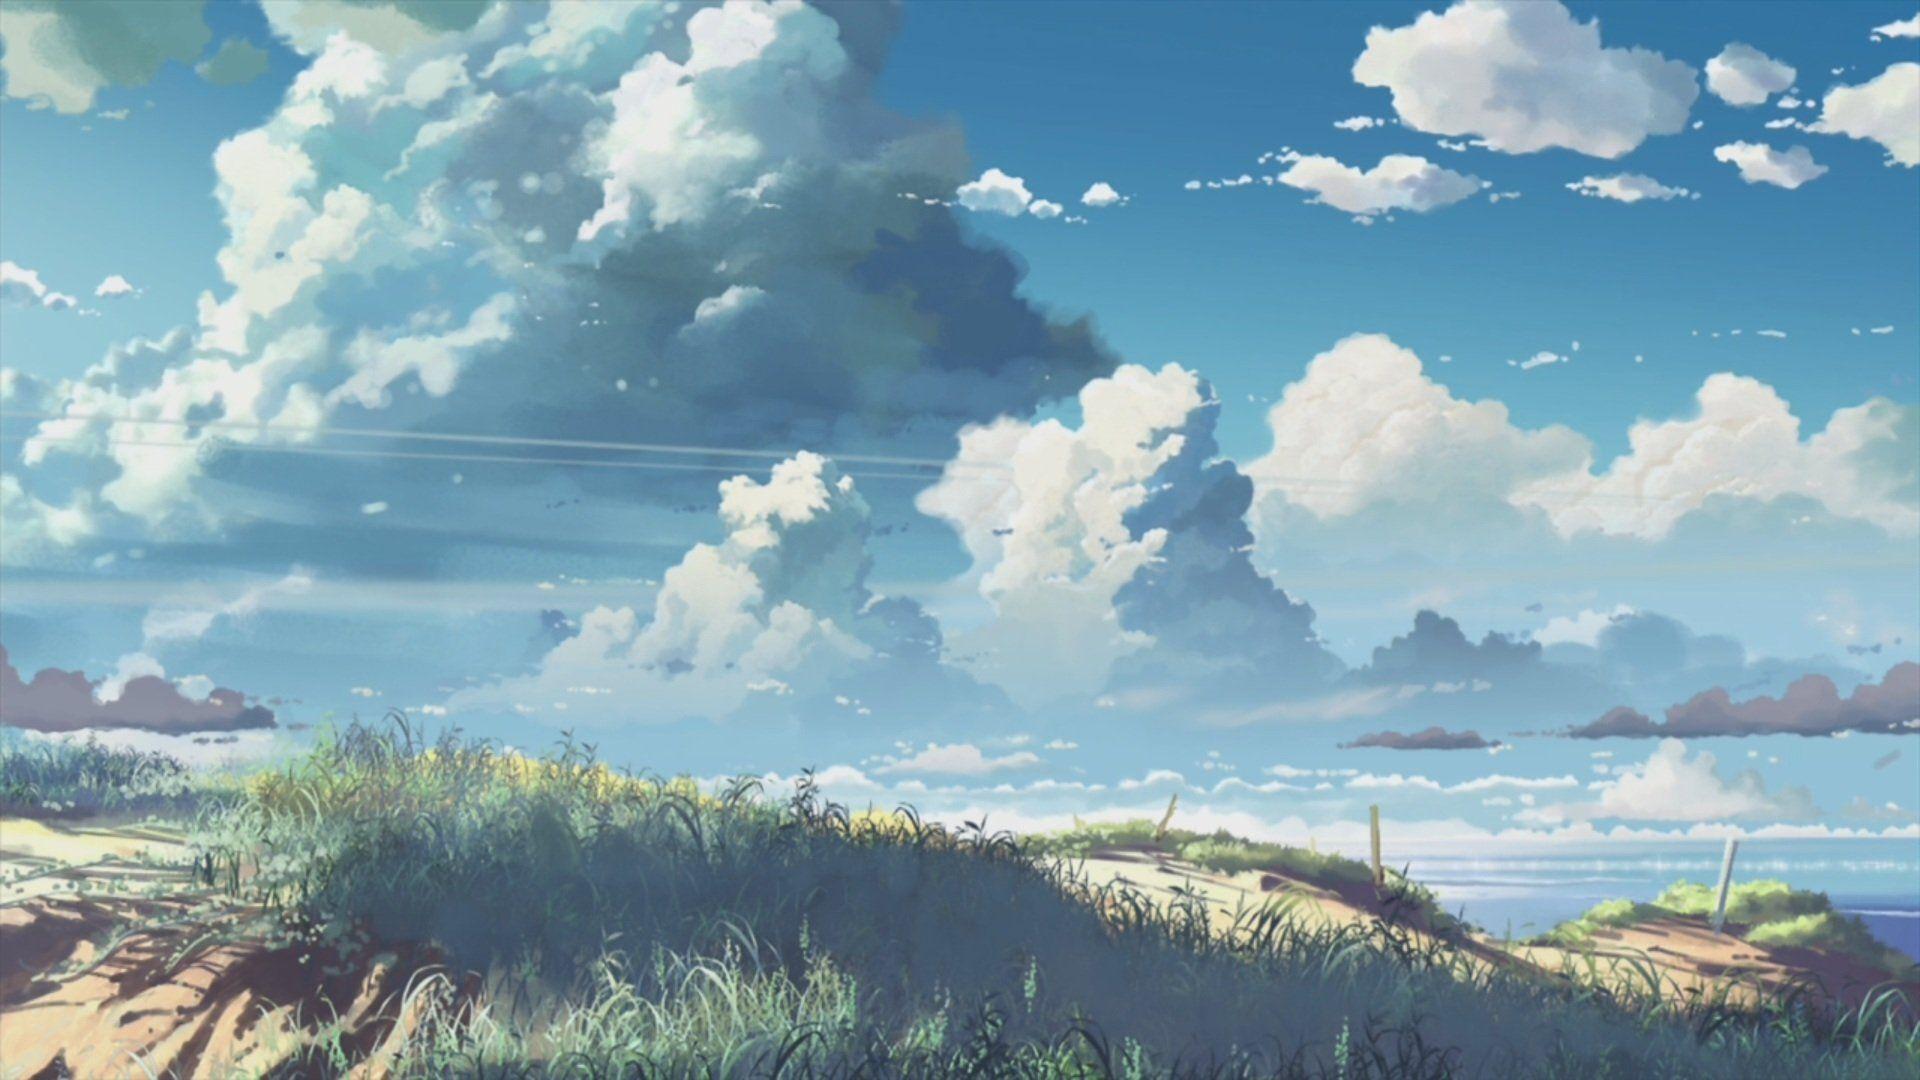 Anime Scenery Anime Beautiful Scenery Wallpaper Hd Anime Scenery Scenery Background Anime Scenery Wallpaper